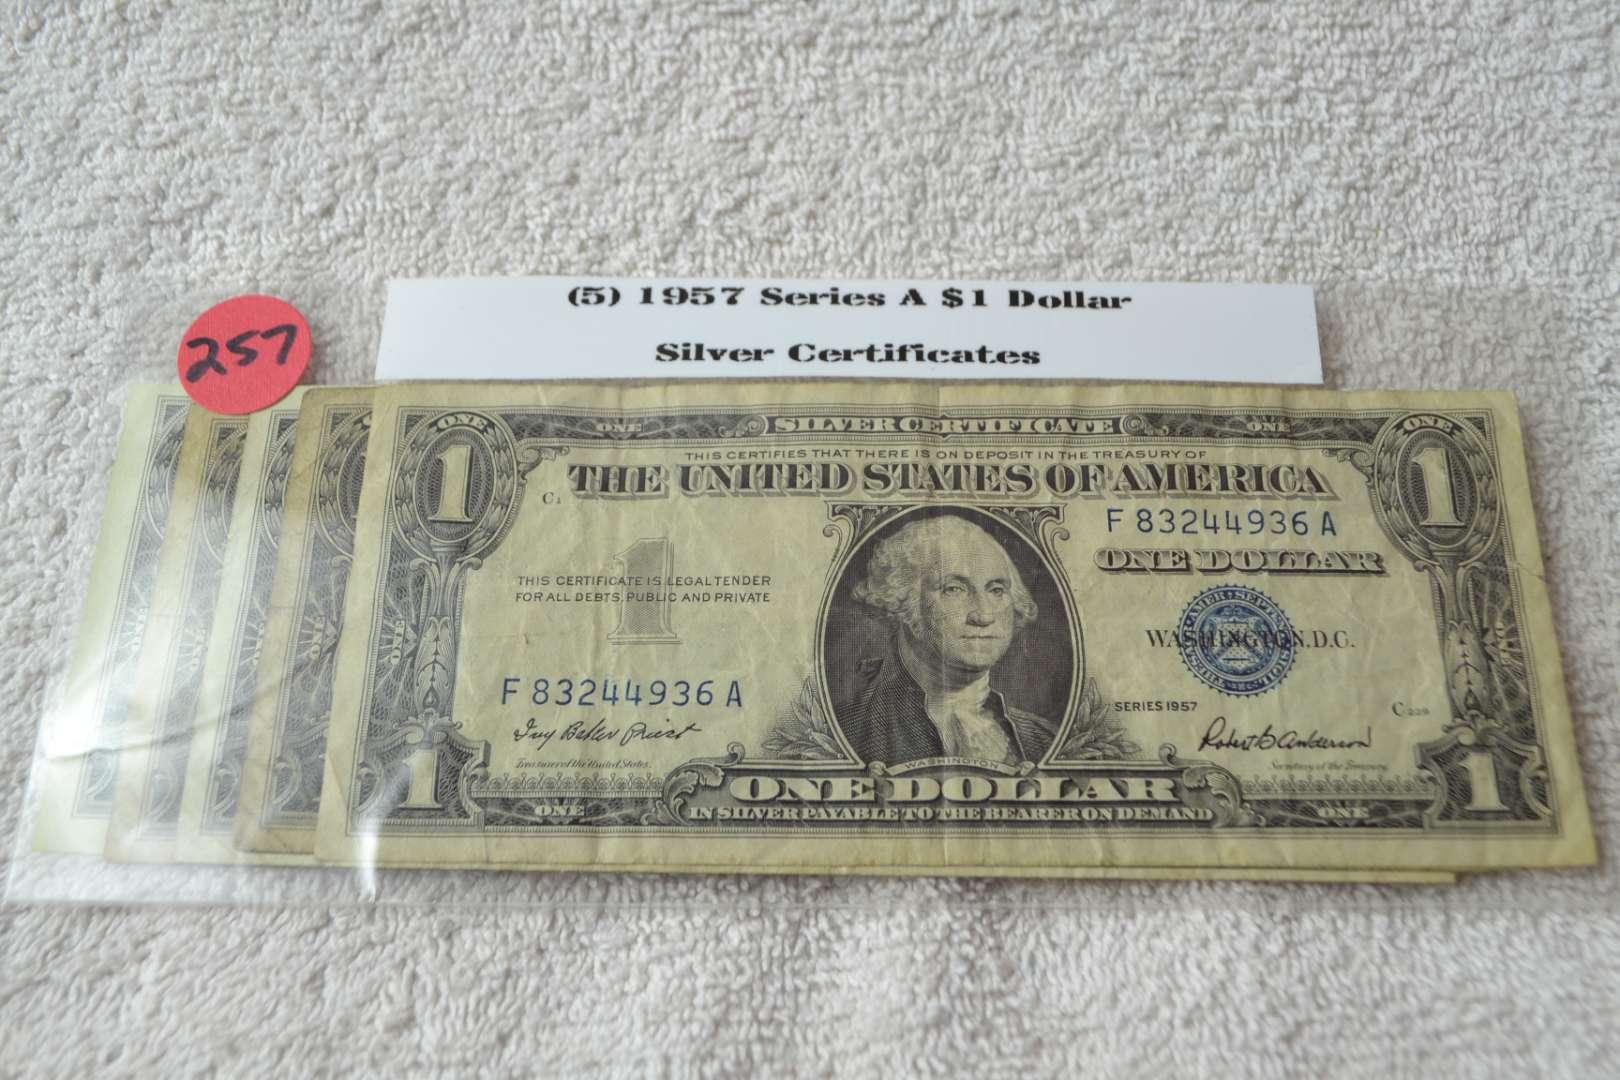 Lot # 257 FIVE 1957 SERIES A $1 SILVER CERTIFICATE